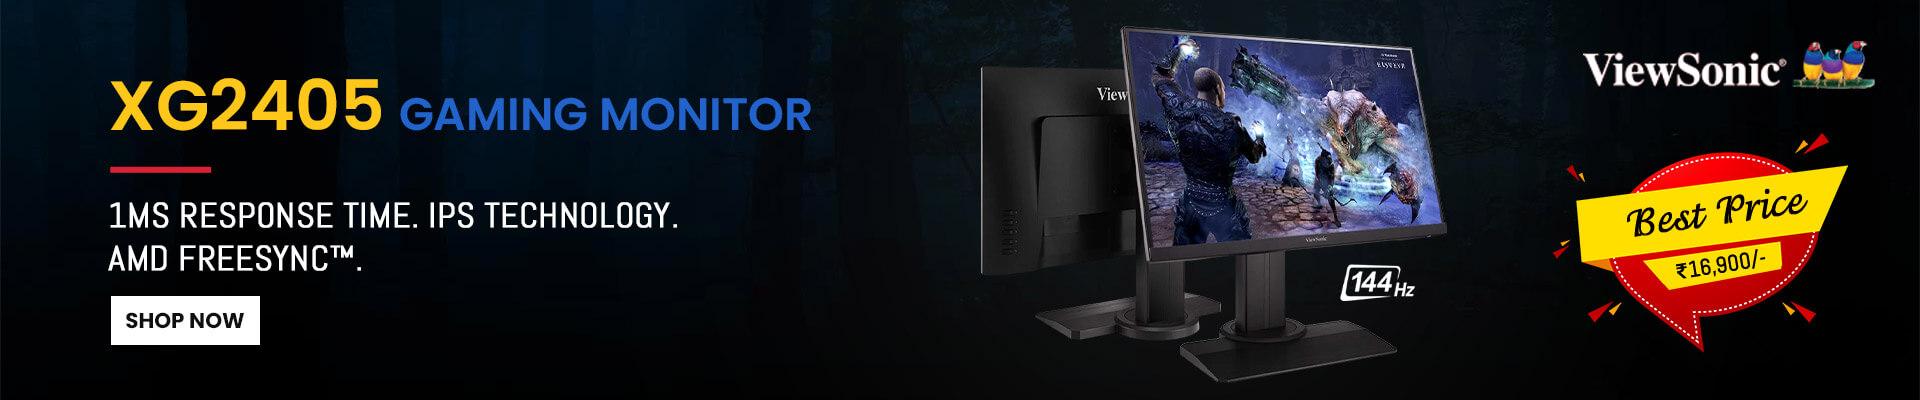 Buy ViewSonic XG2405 Gaming Monitor